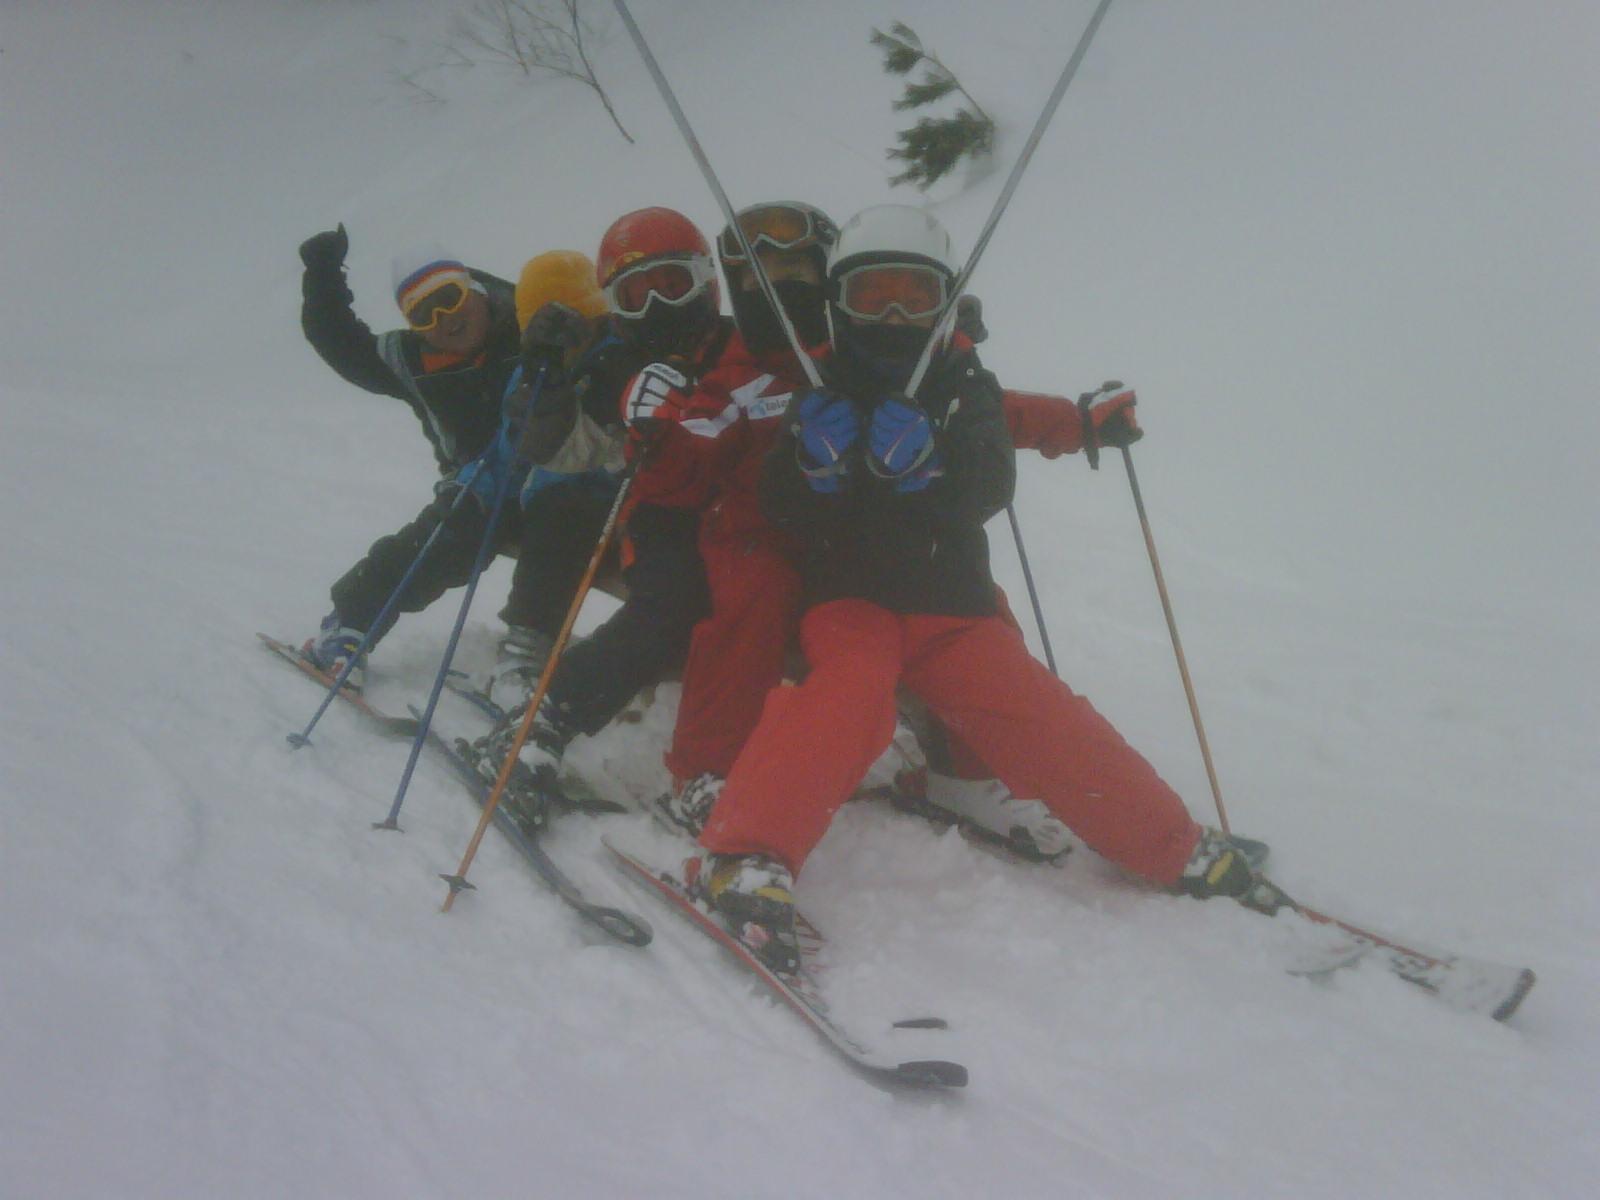 スキー教室_b0152504_9214147.jpg